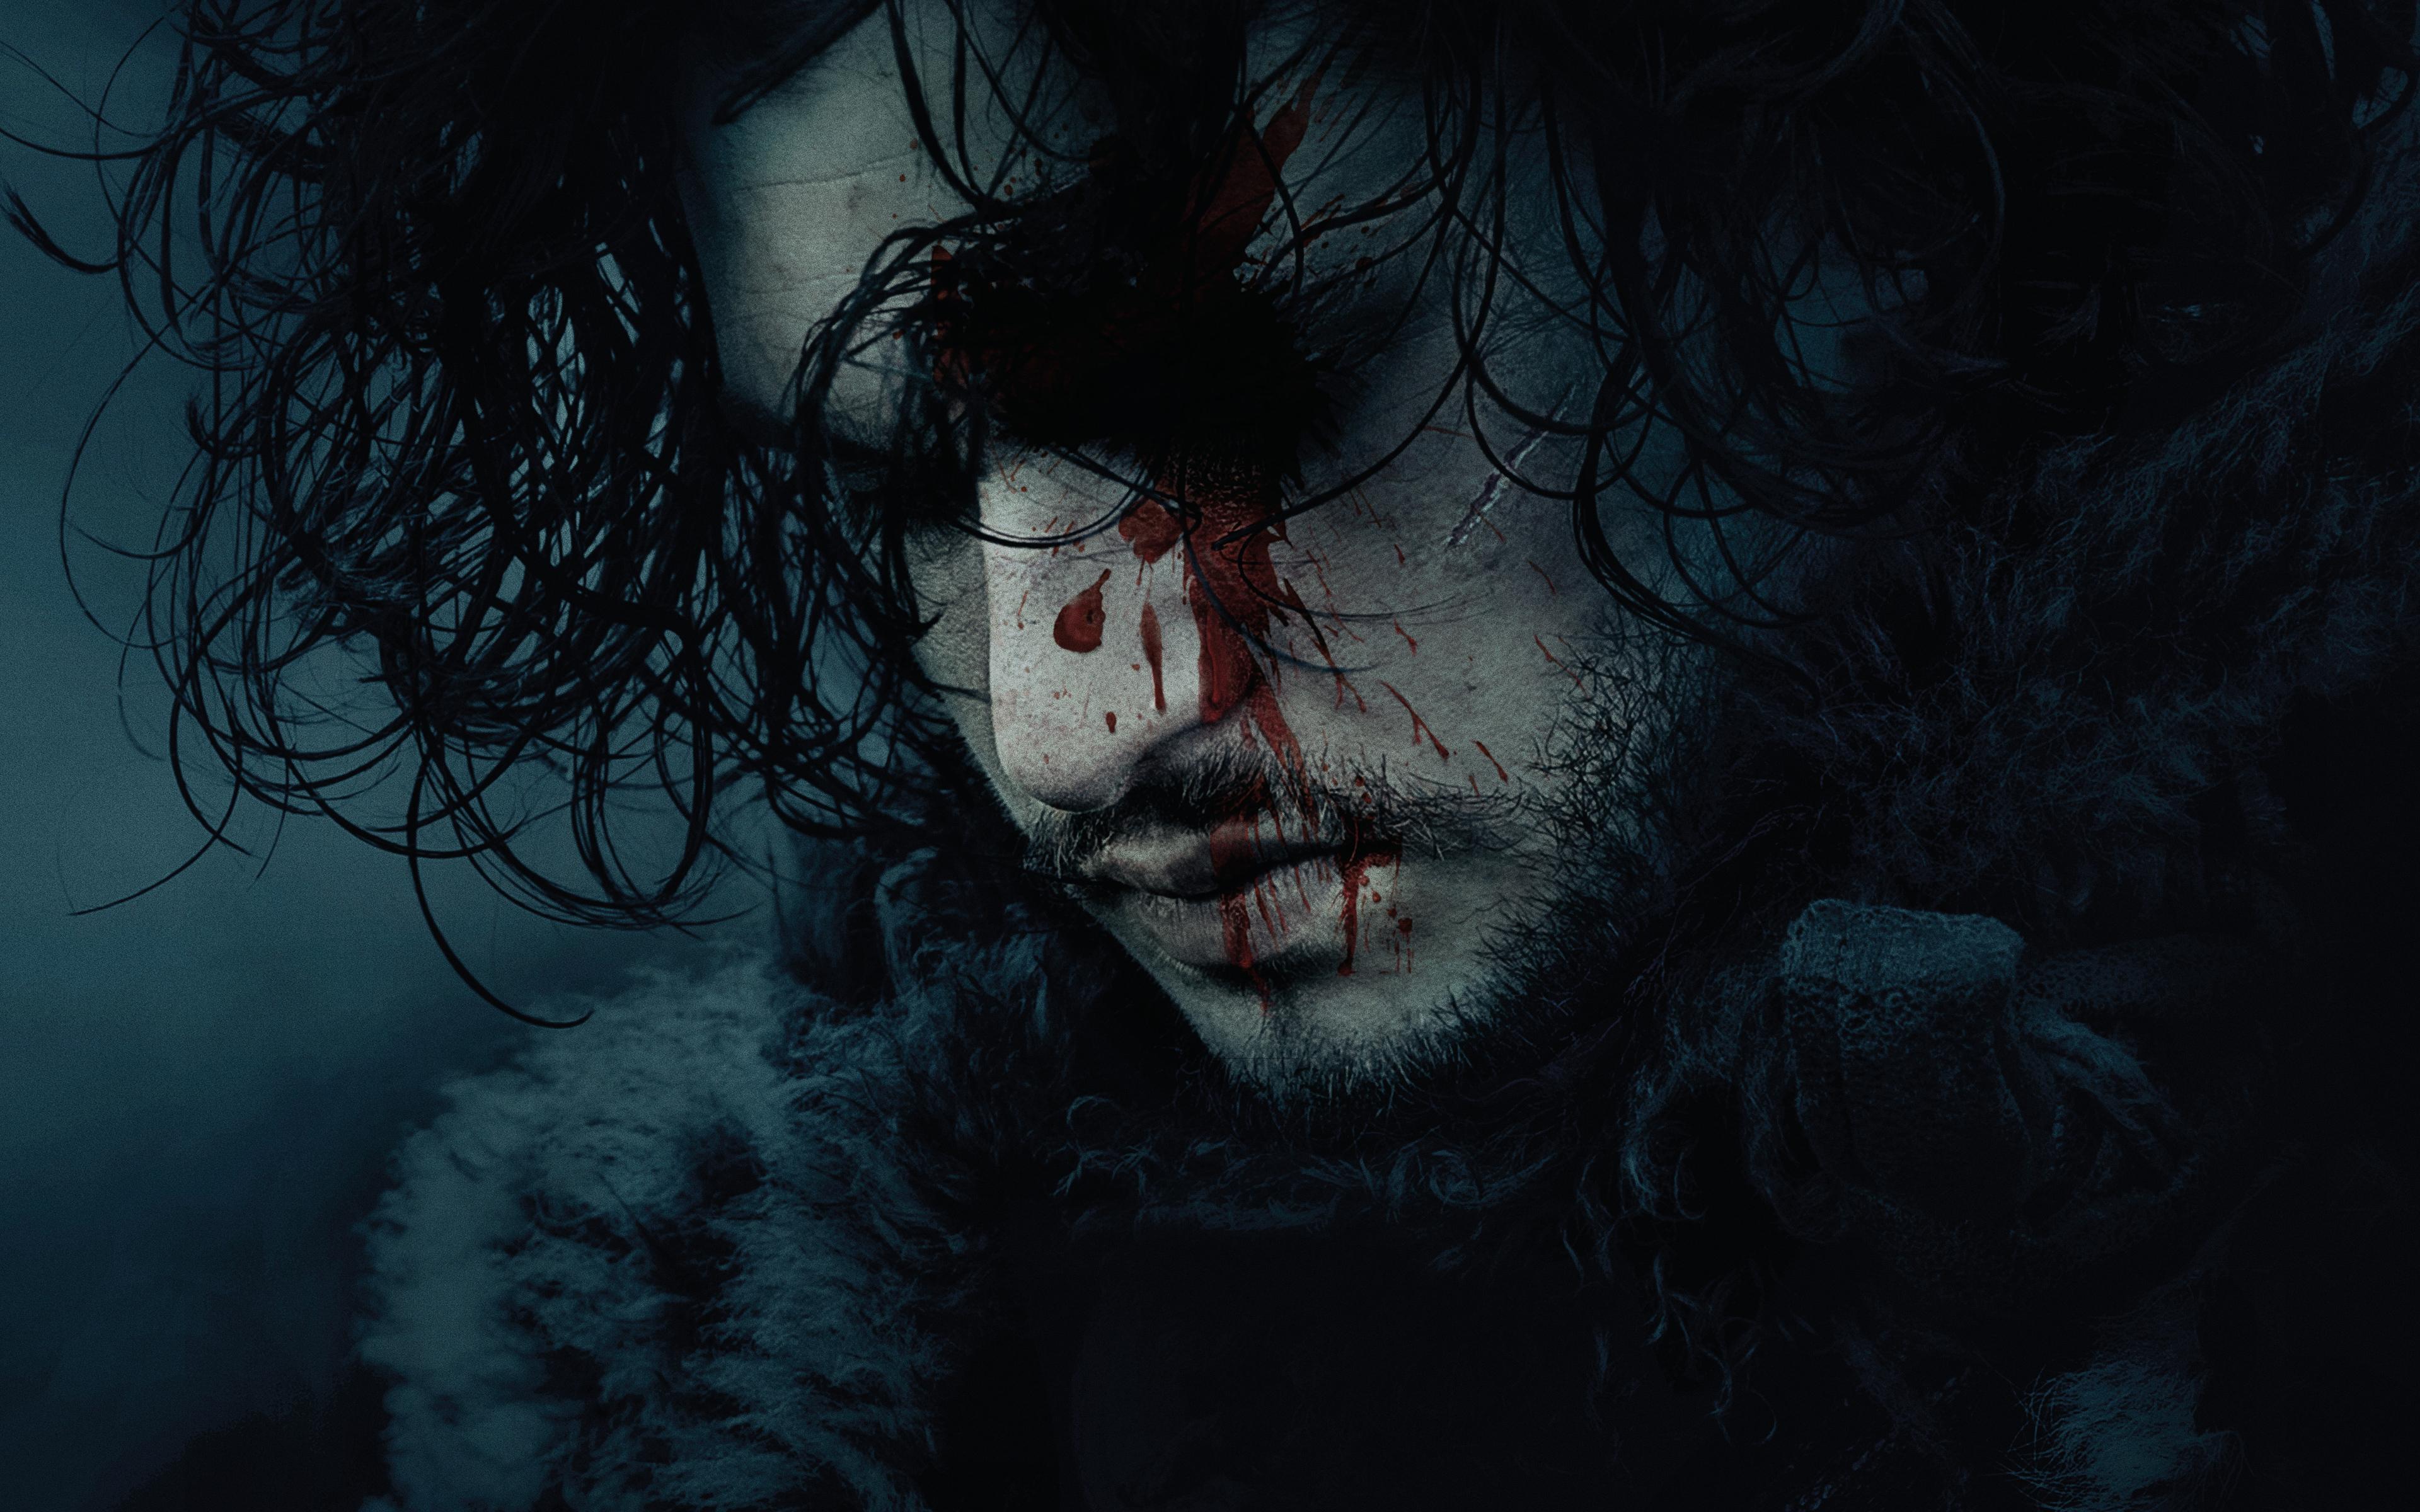 Kit Harington as Jon Snow in Game of Thrones 4K Wallpapers HD 3840x2400